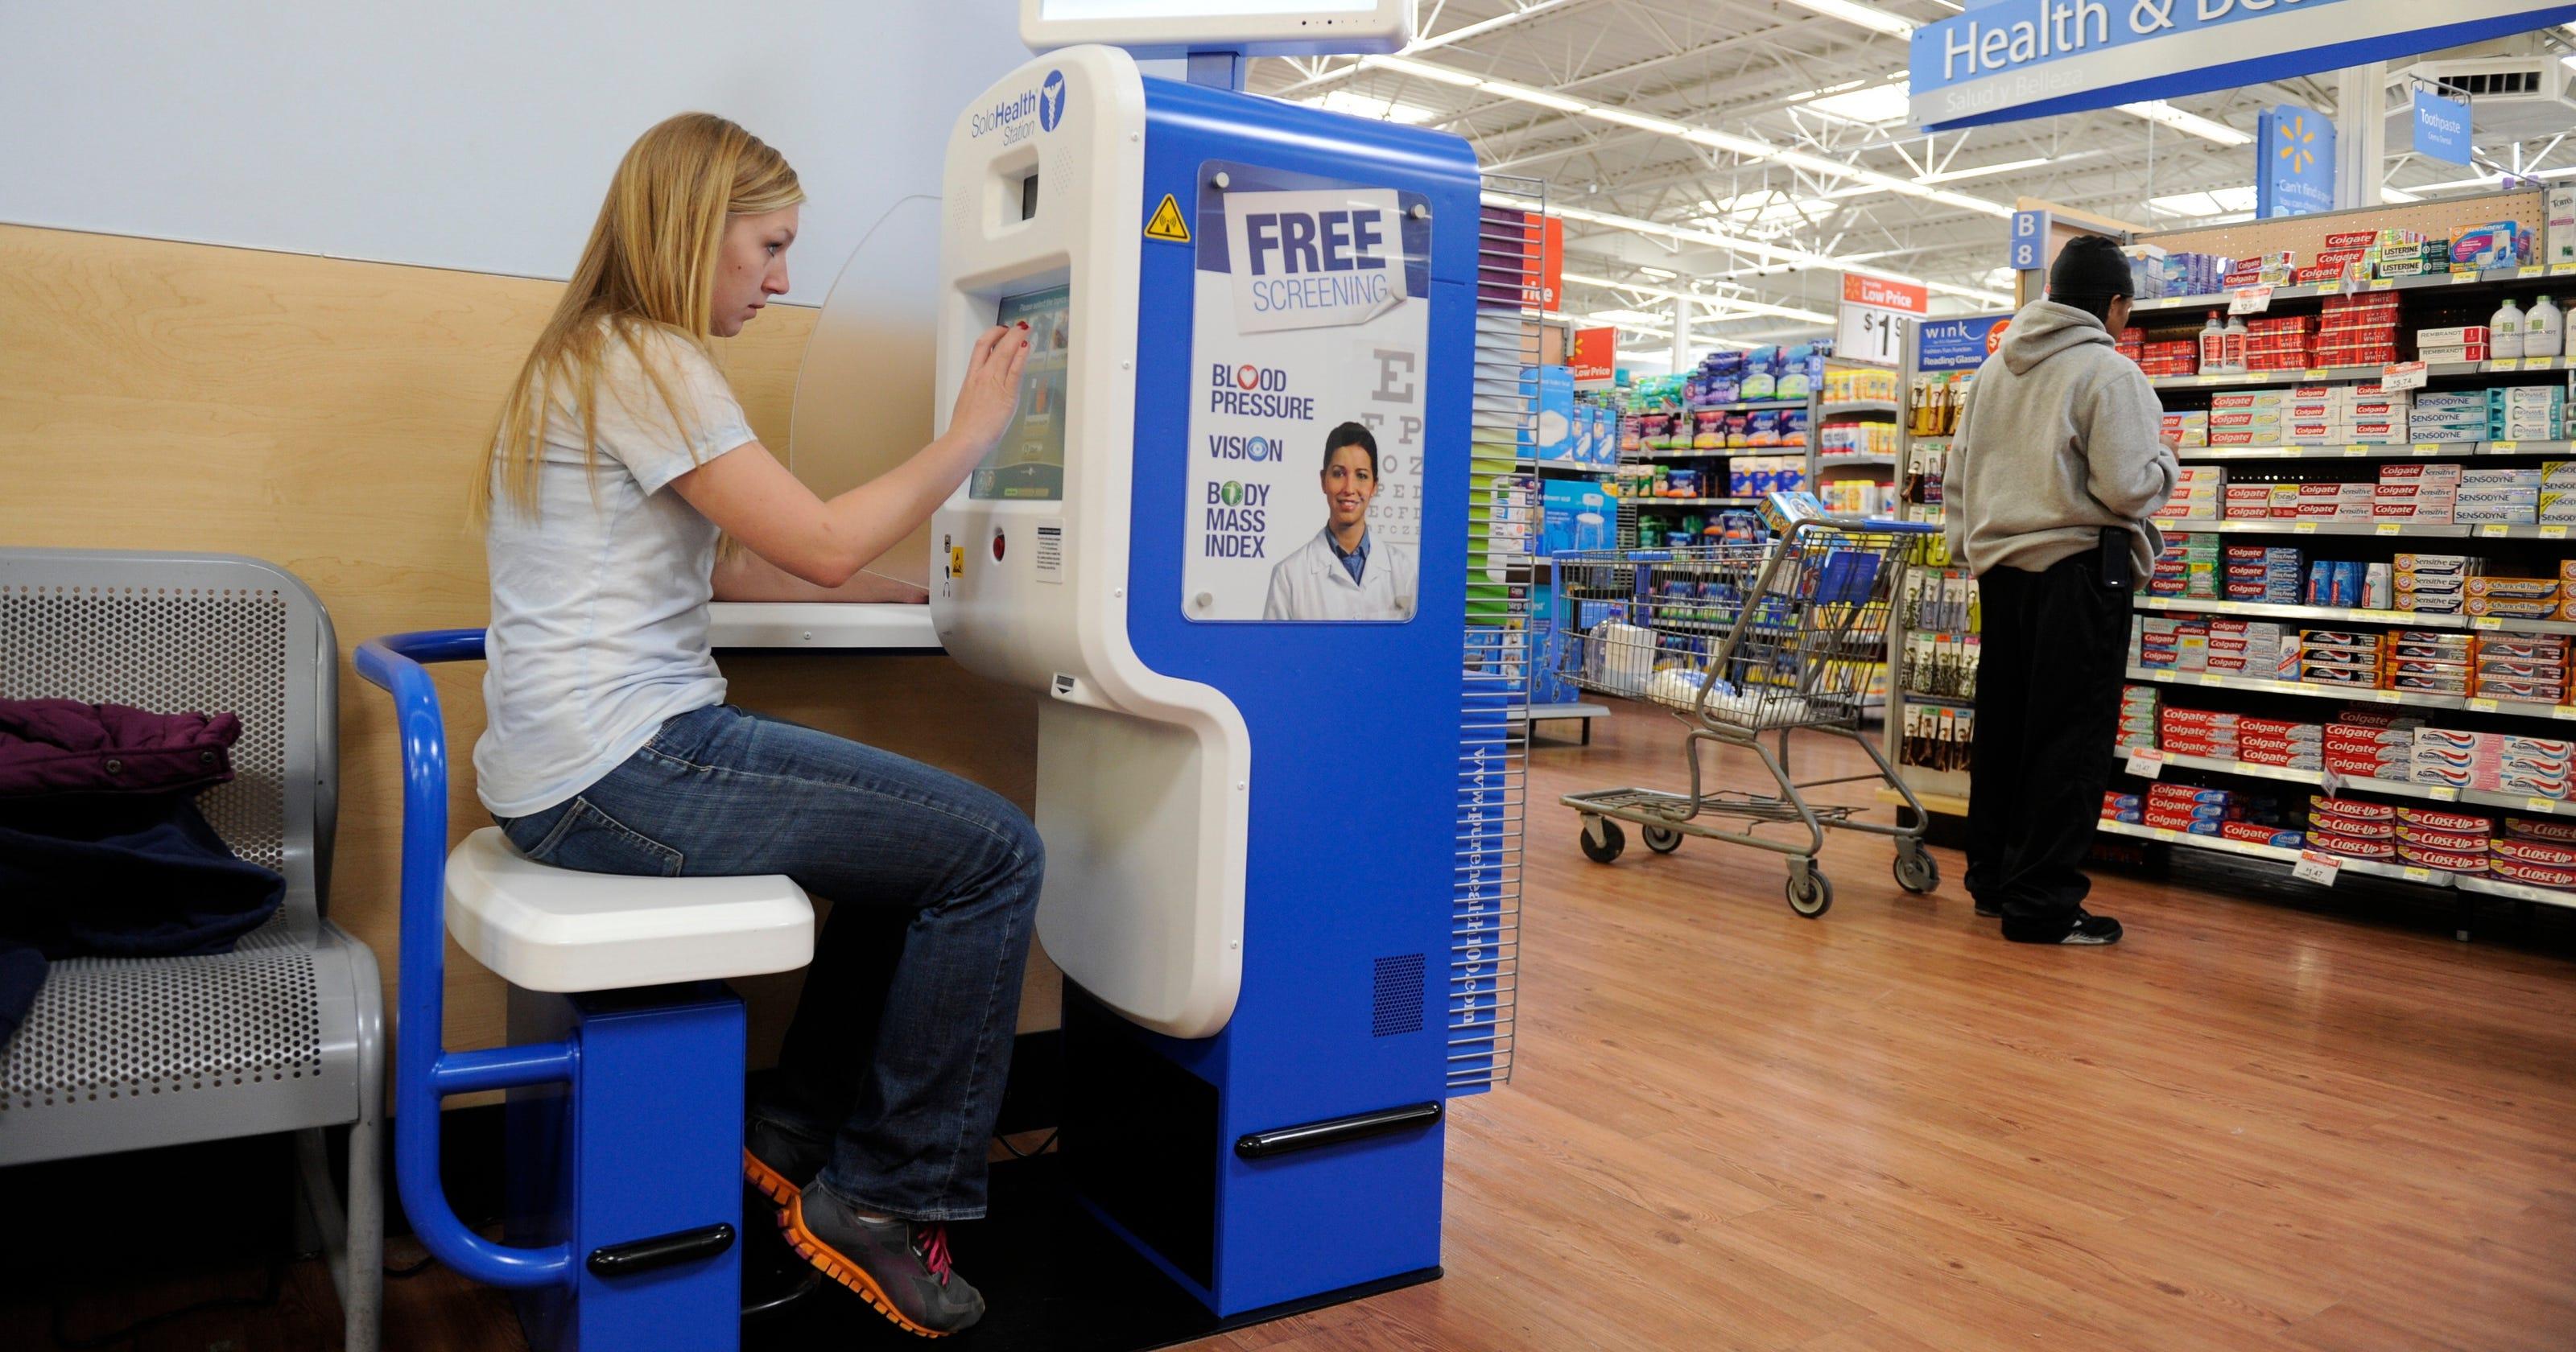 Companies invest in self service health kiosks solutioingenieria Images